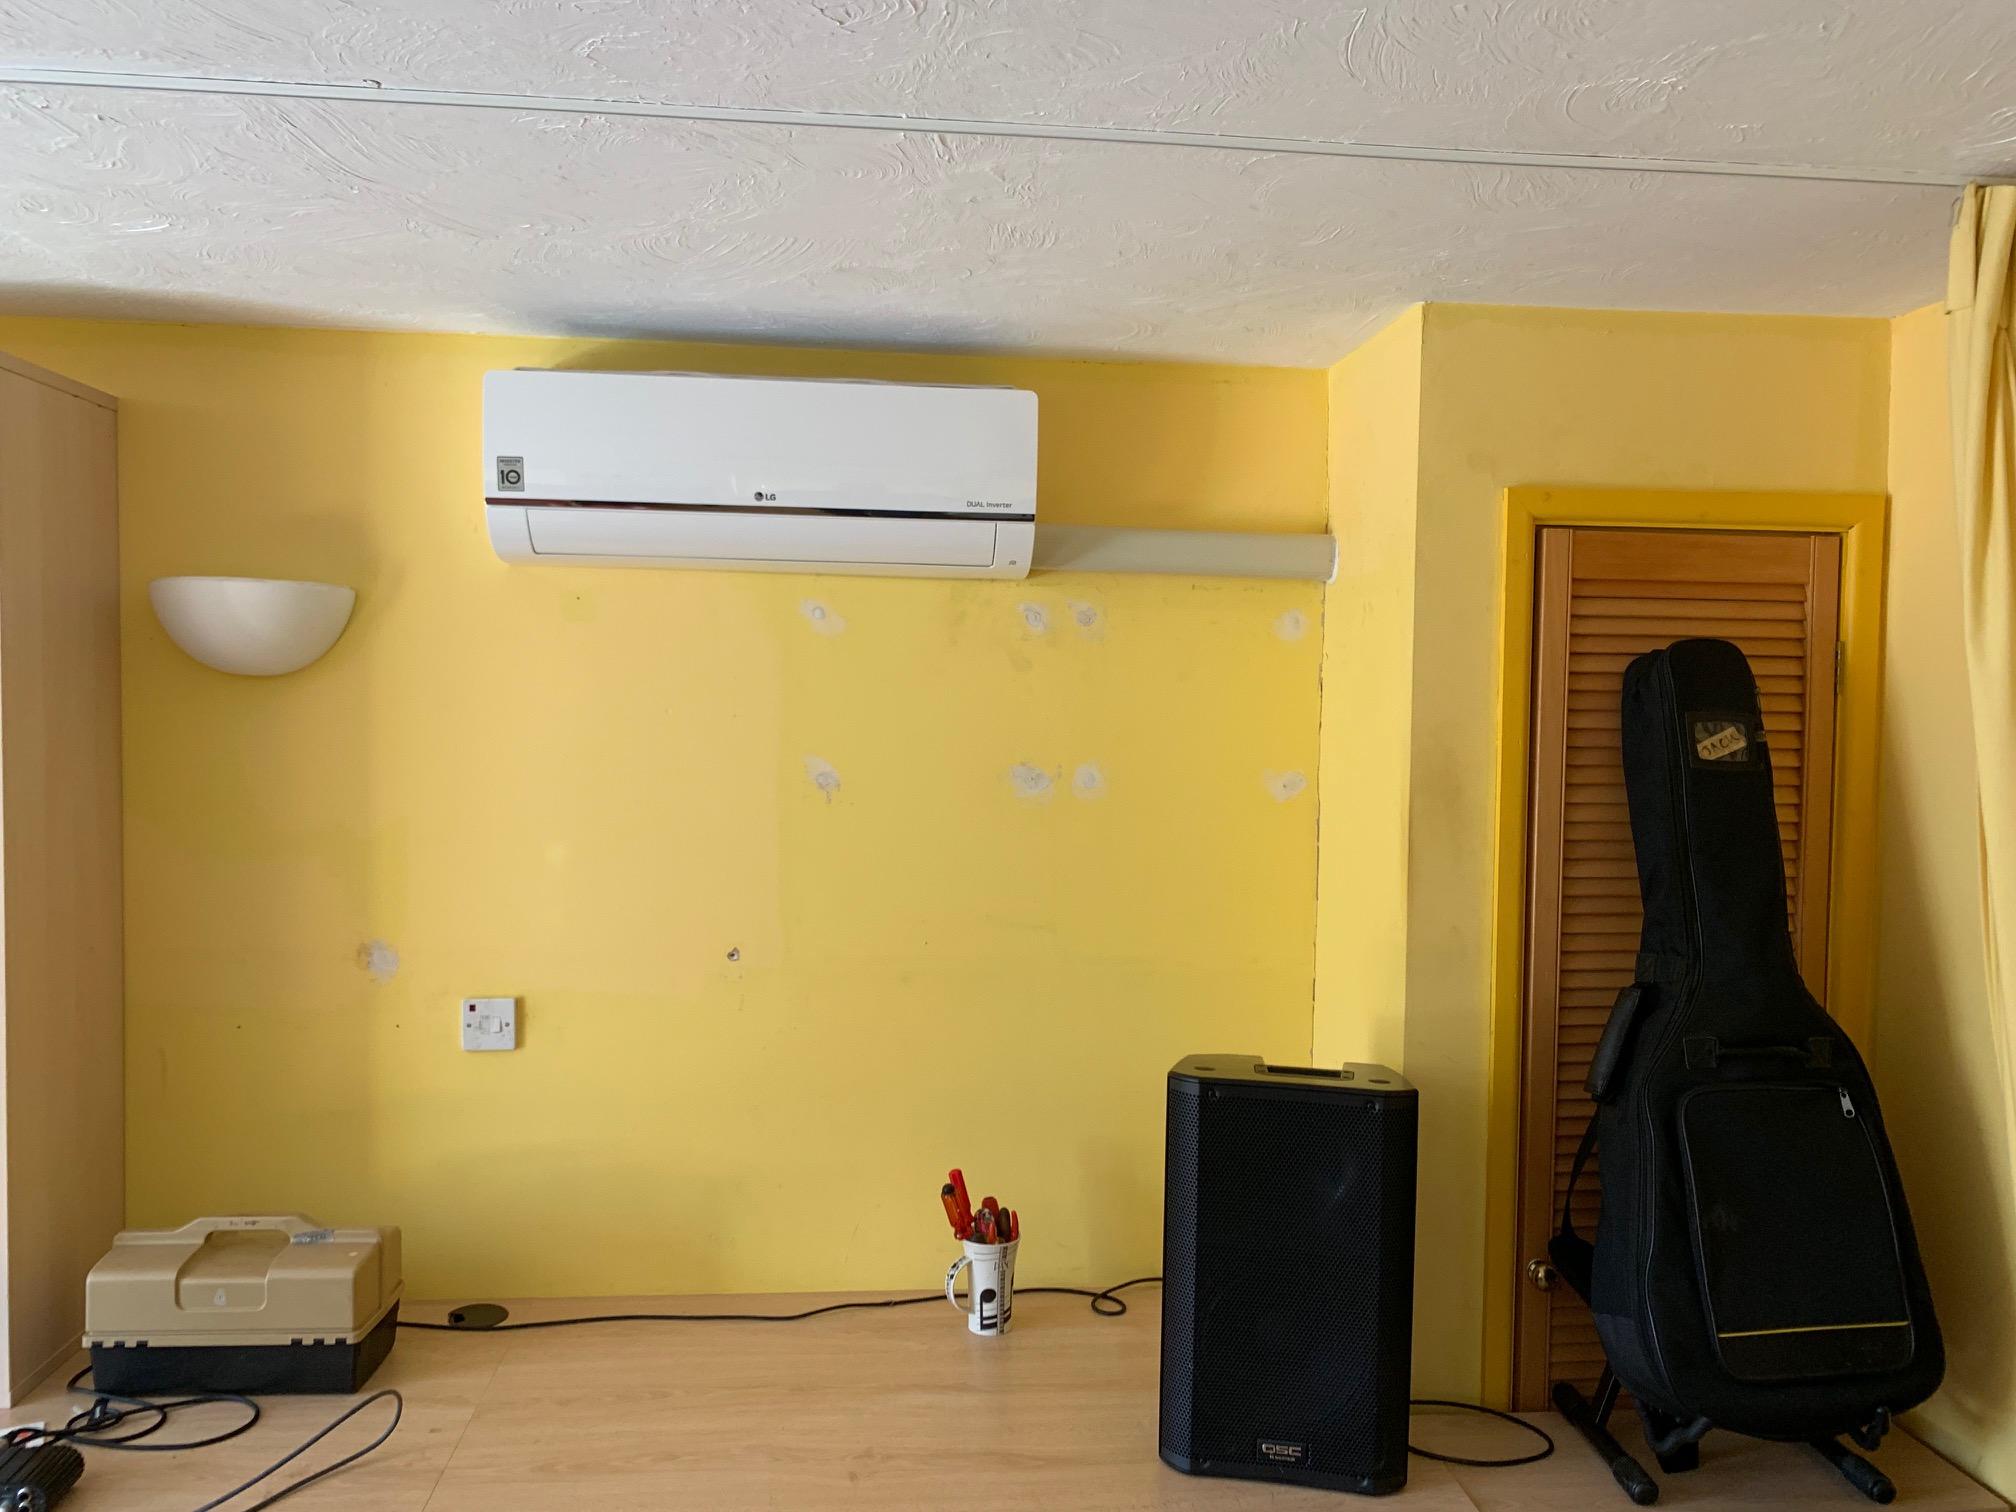 3.5kw LG wall units